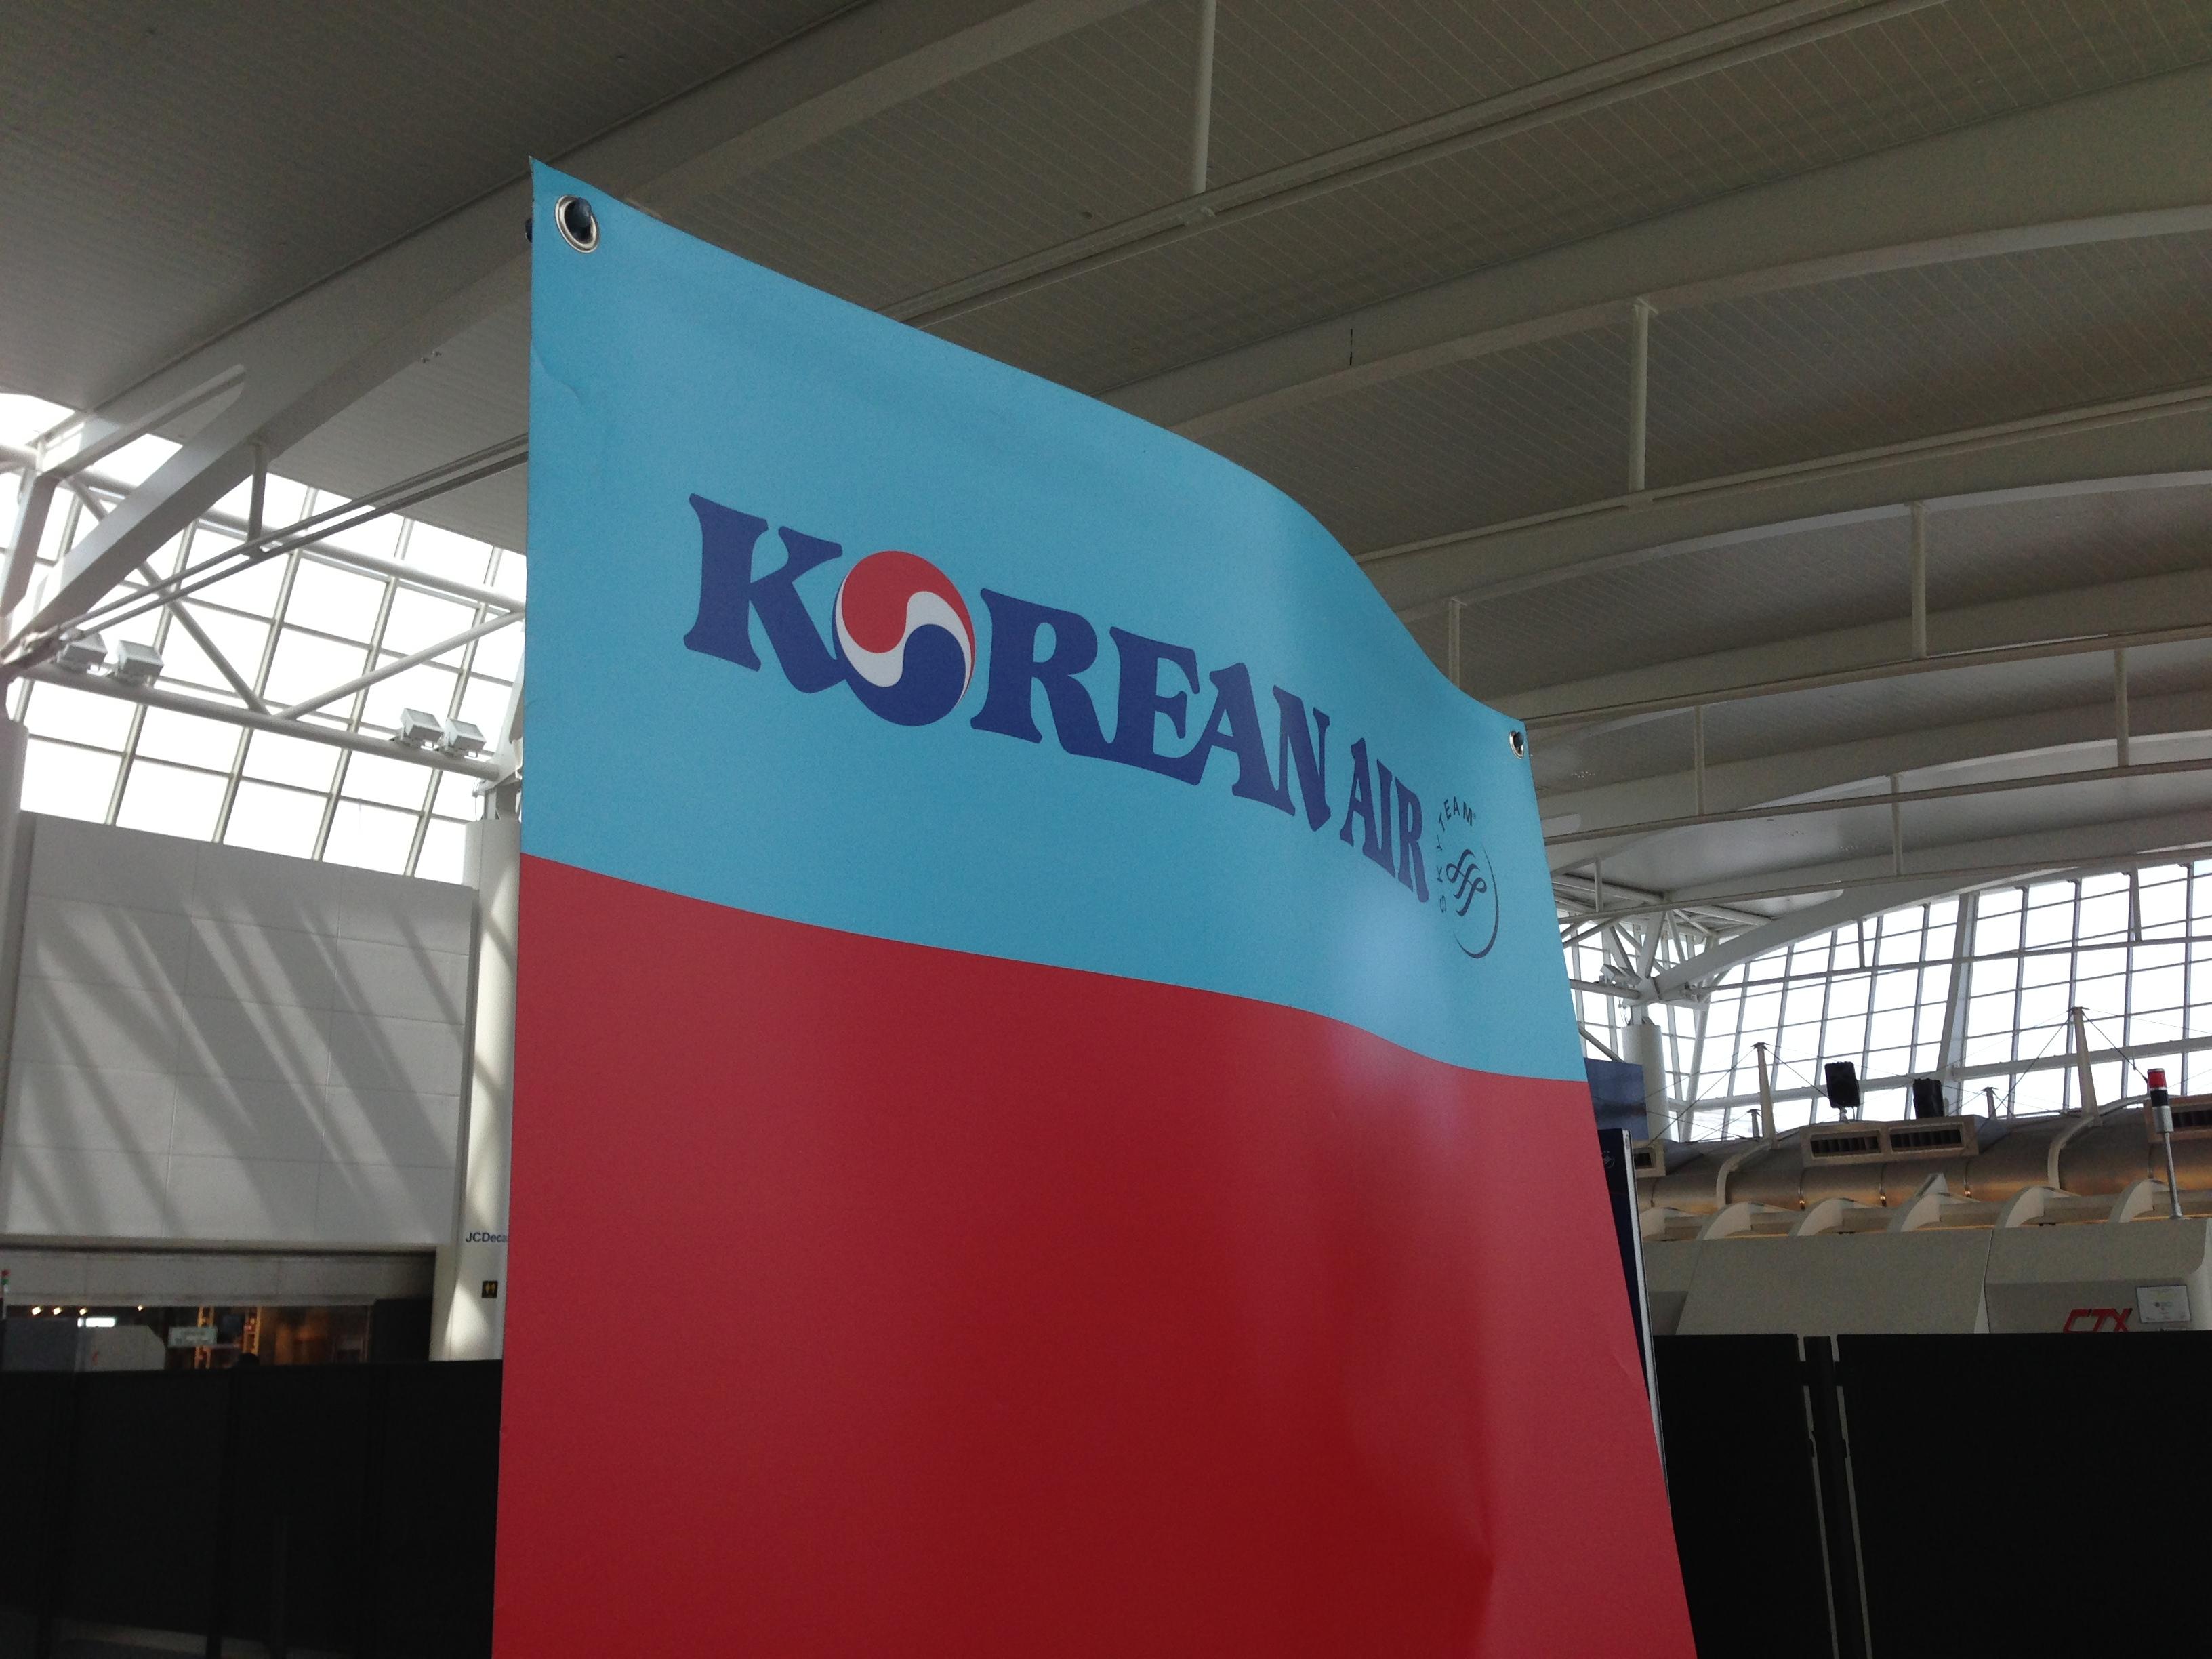 coreano matchmaking NYC